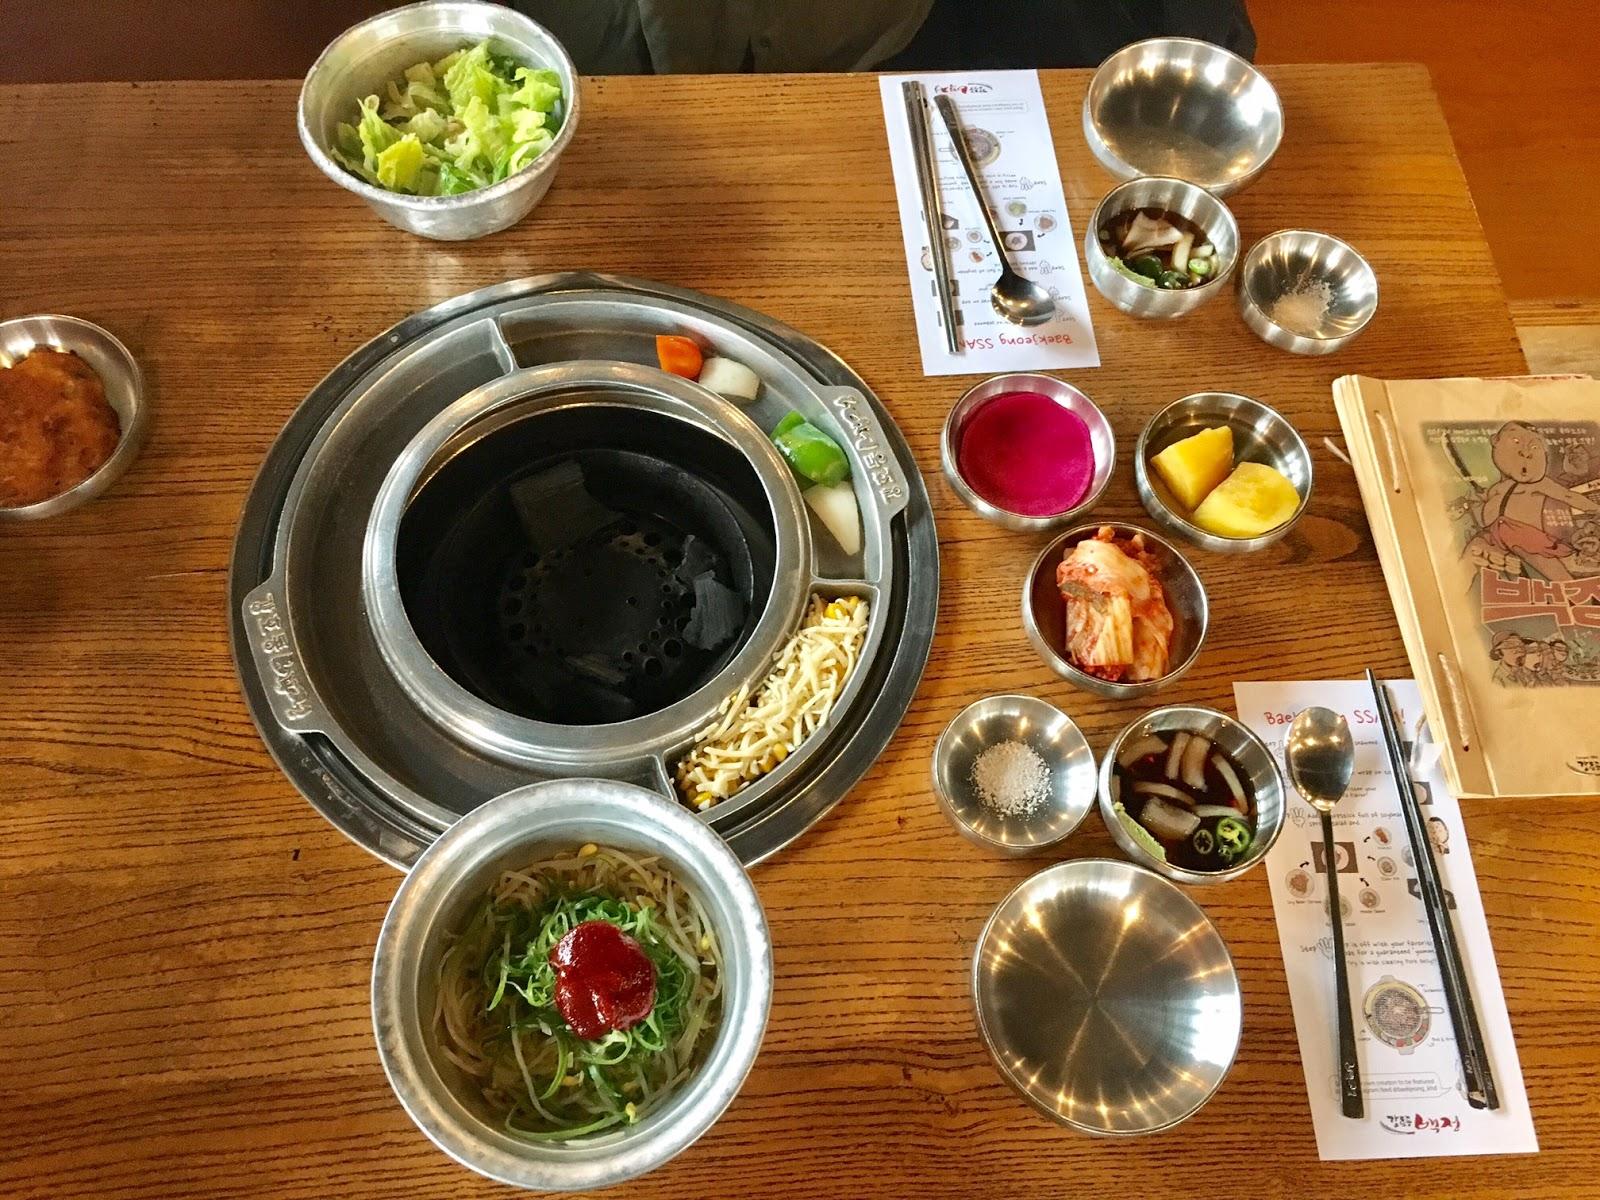 The Food Seeker: KANG HO DONG BAEKJEONG (BUENA PARK, CA)